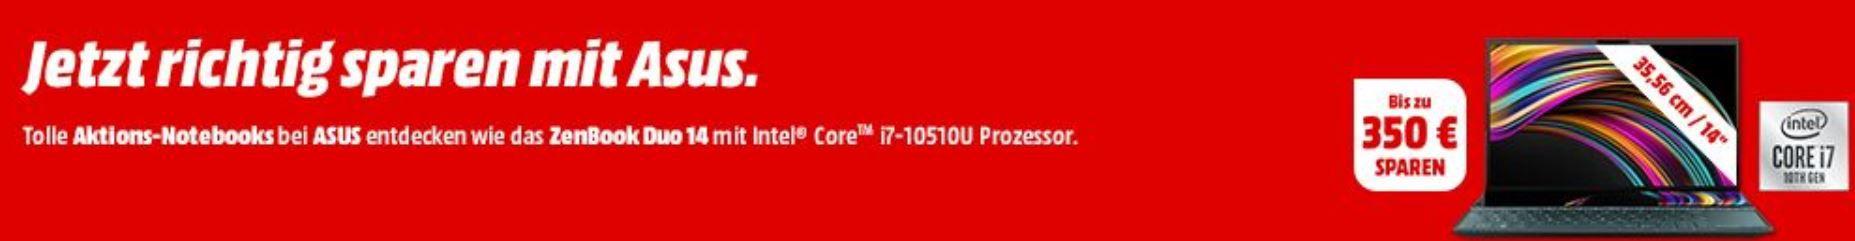 Media Markt ASUS Markentage: z.B. ASUS ROG Gladius II Origin Gaming Maus ab 49€ (statt 65€)